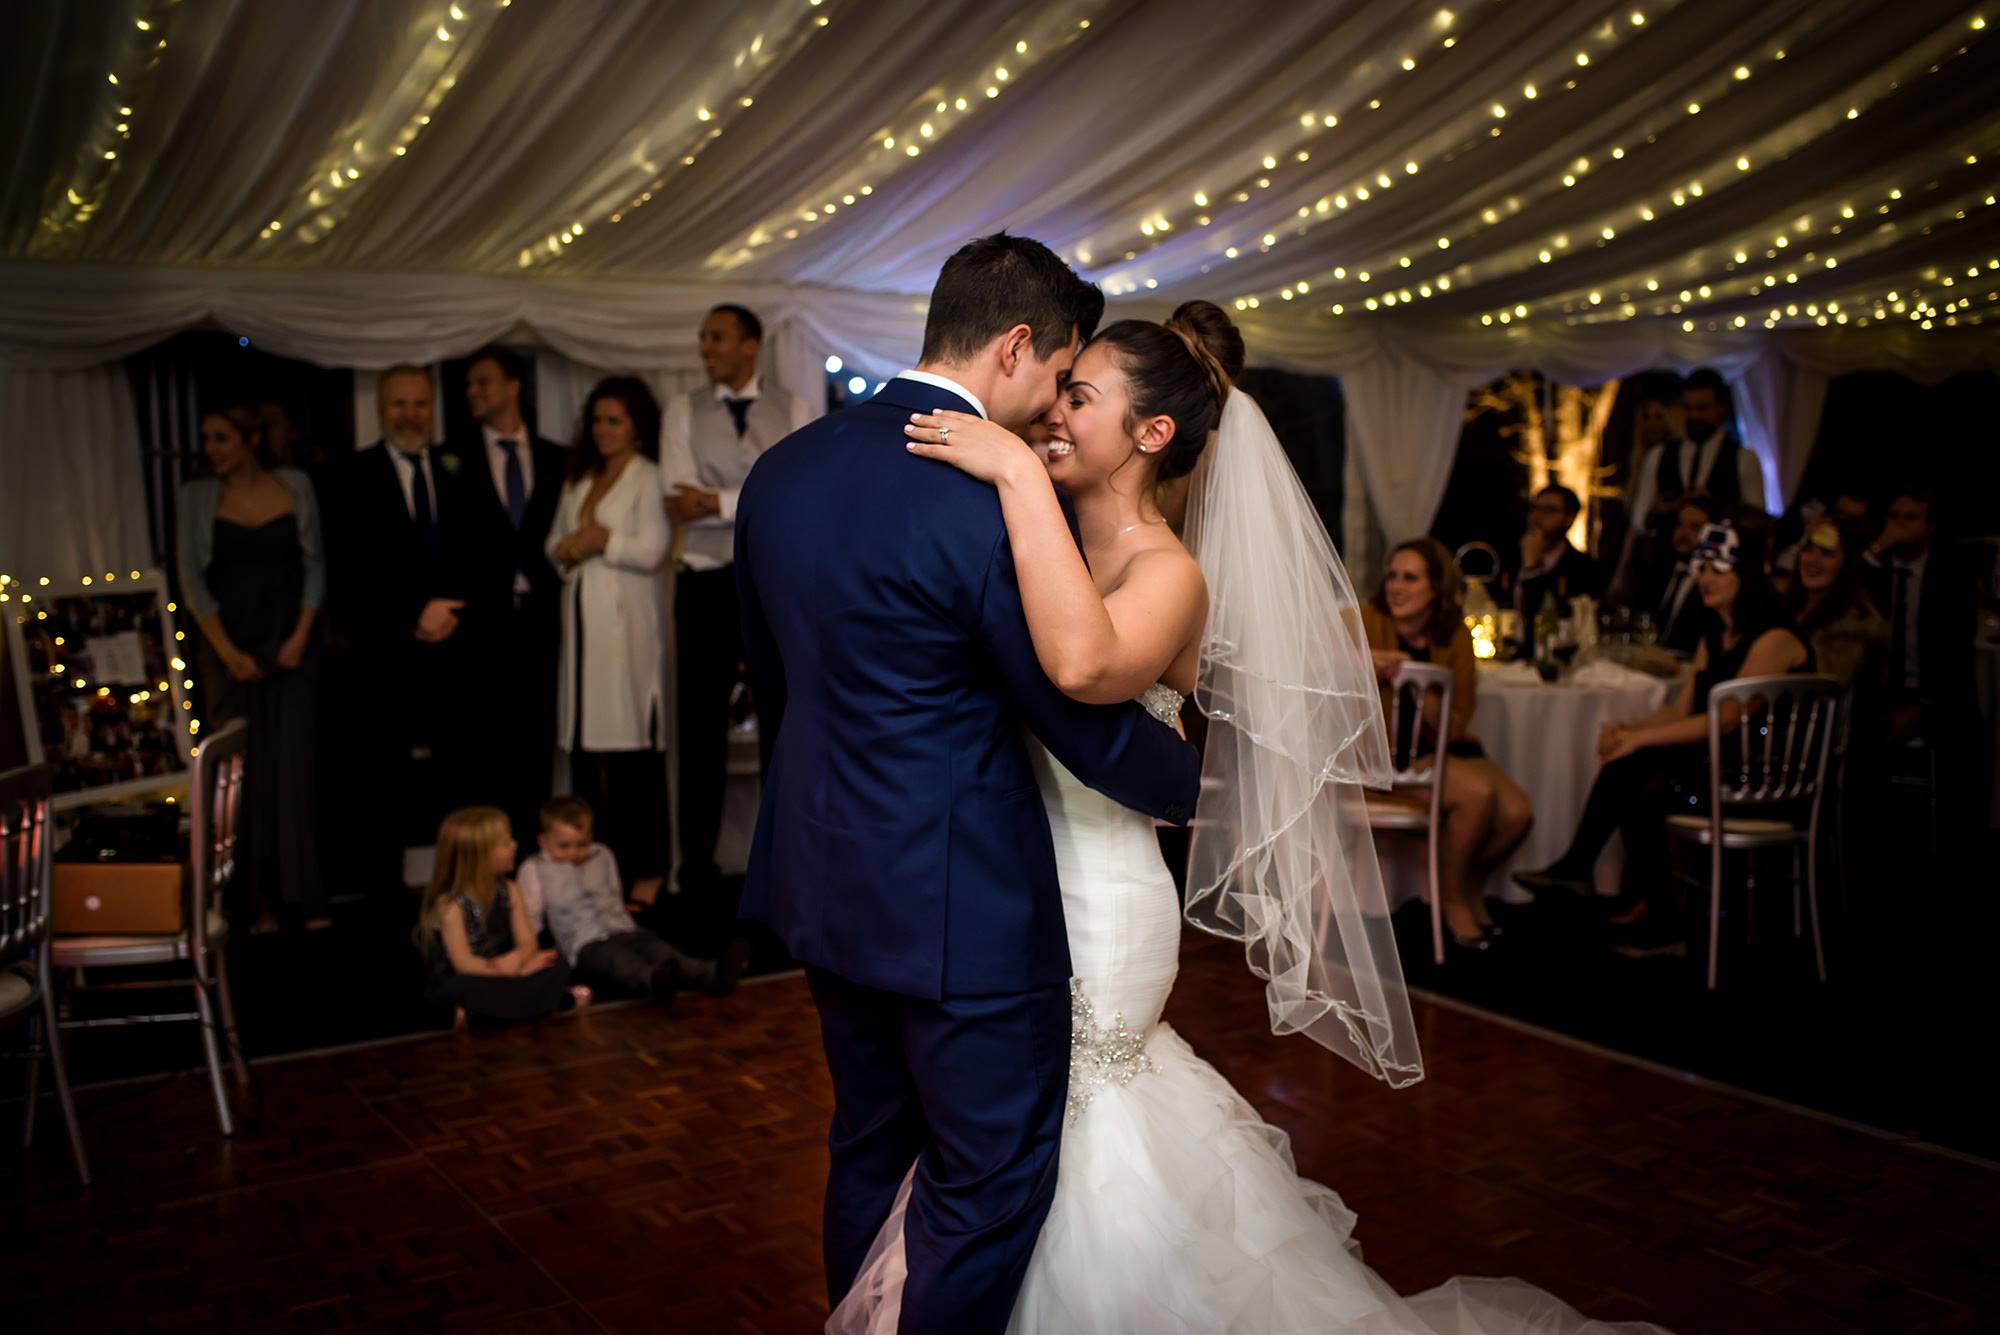 Simon biffen-best of 2015 wedding photographs-54